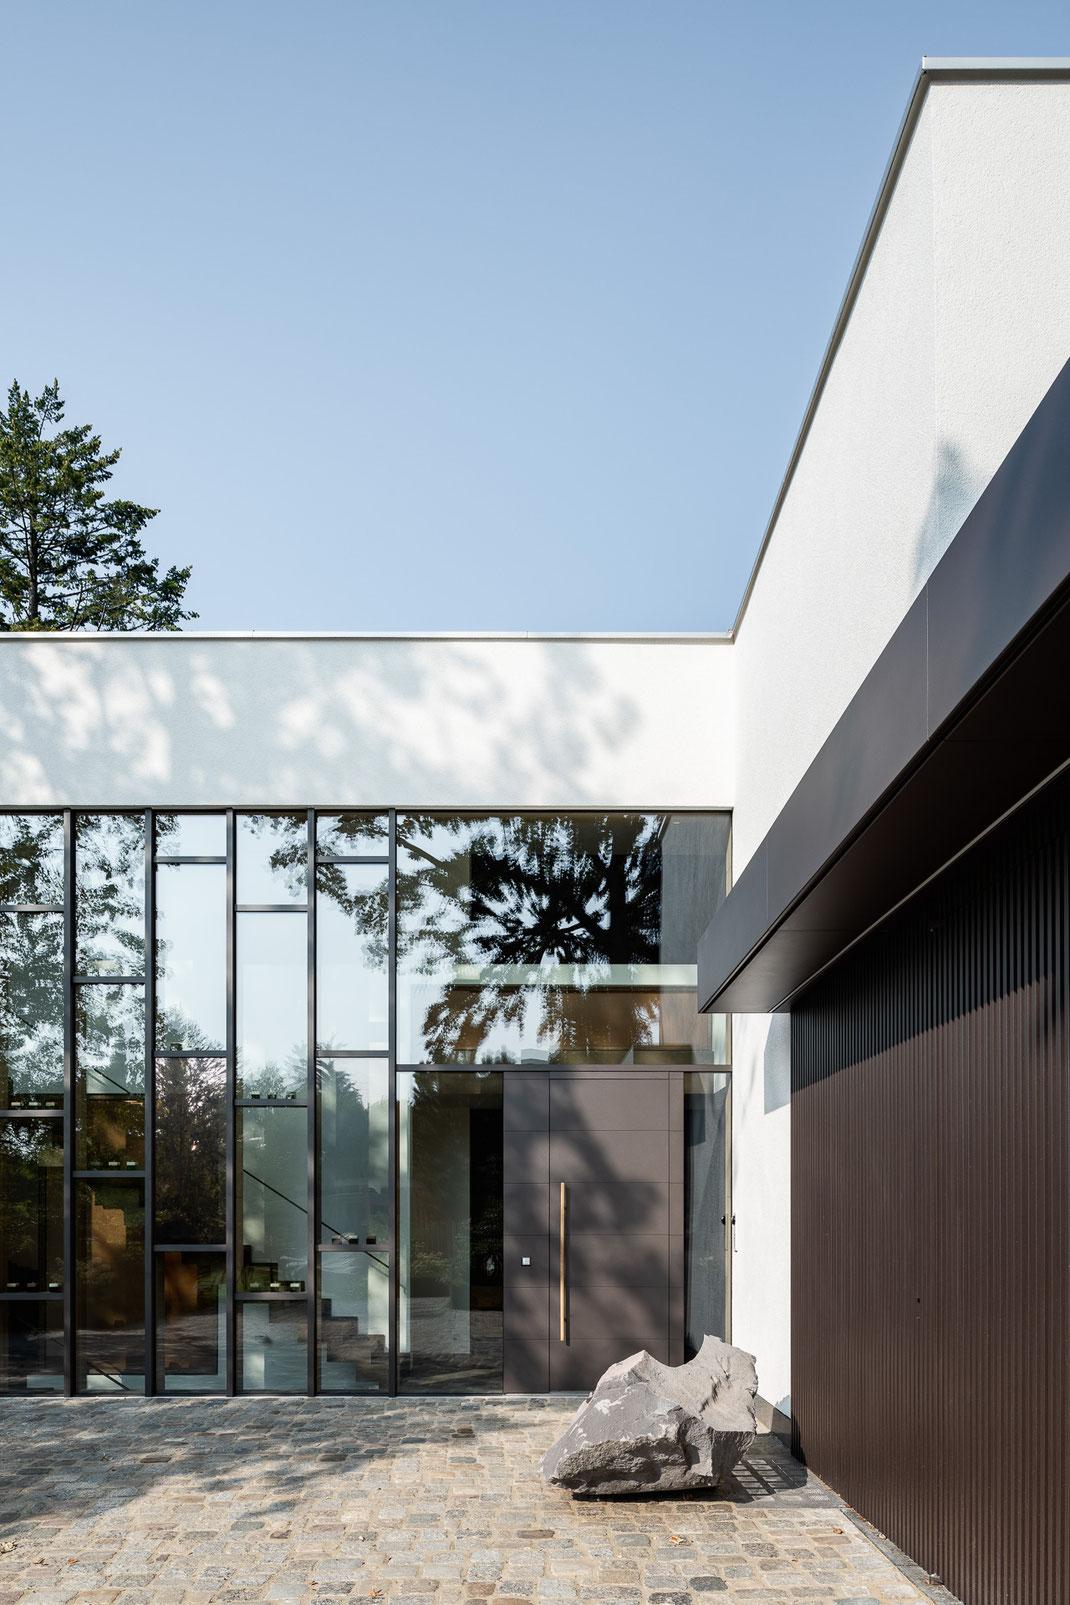 Architektenhaus, Eingang, Architektur von Stephan Maria Lang